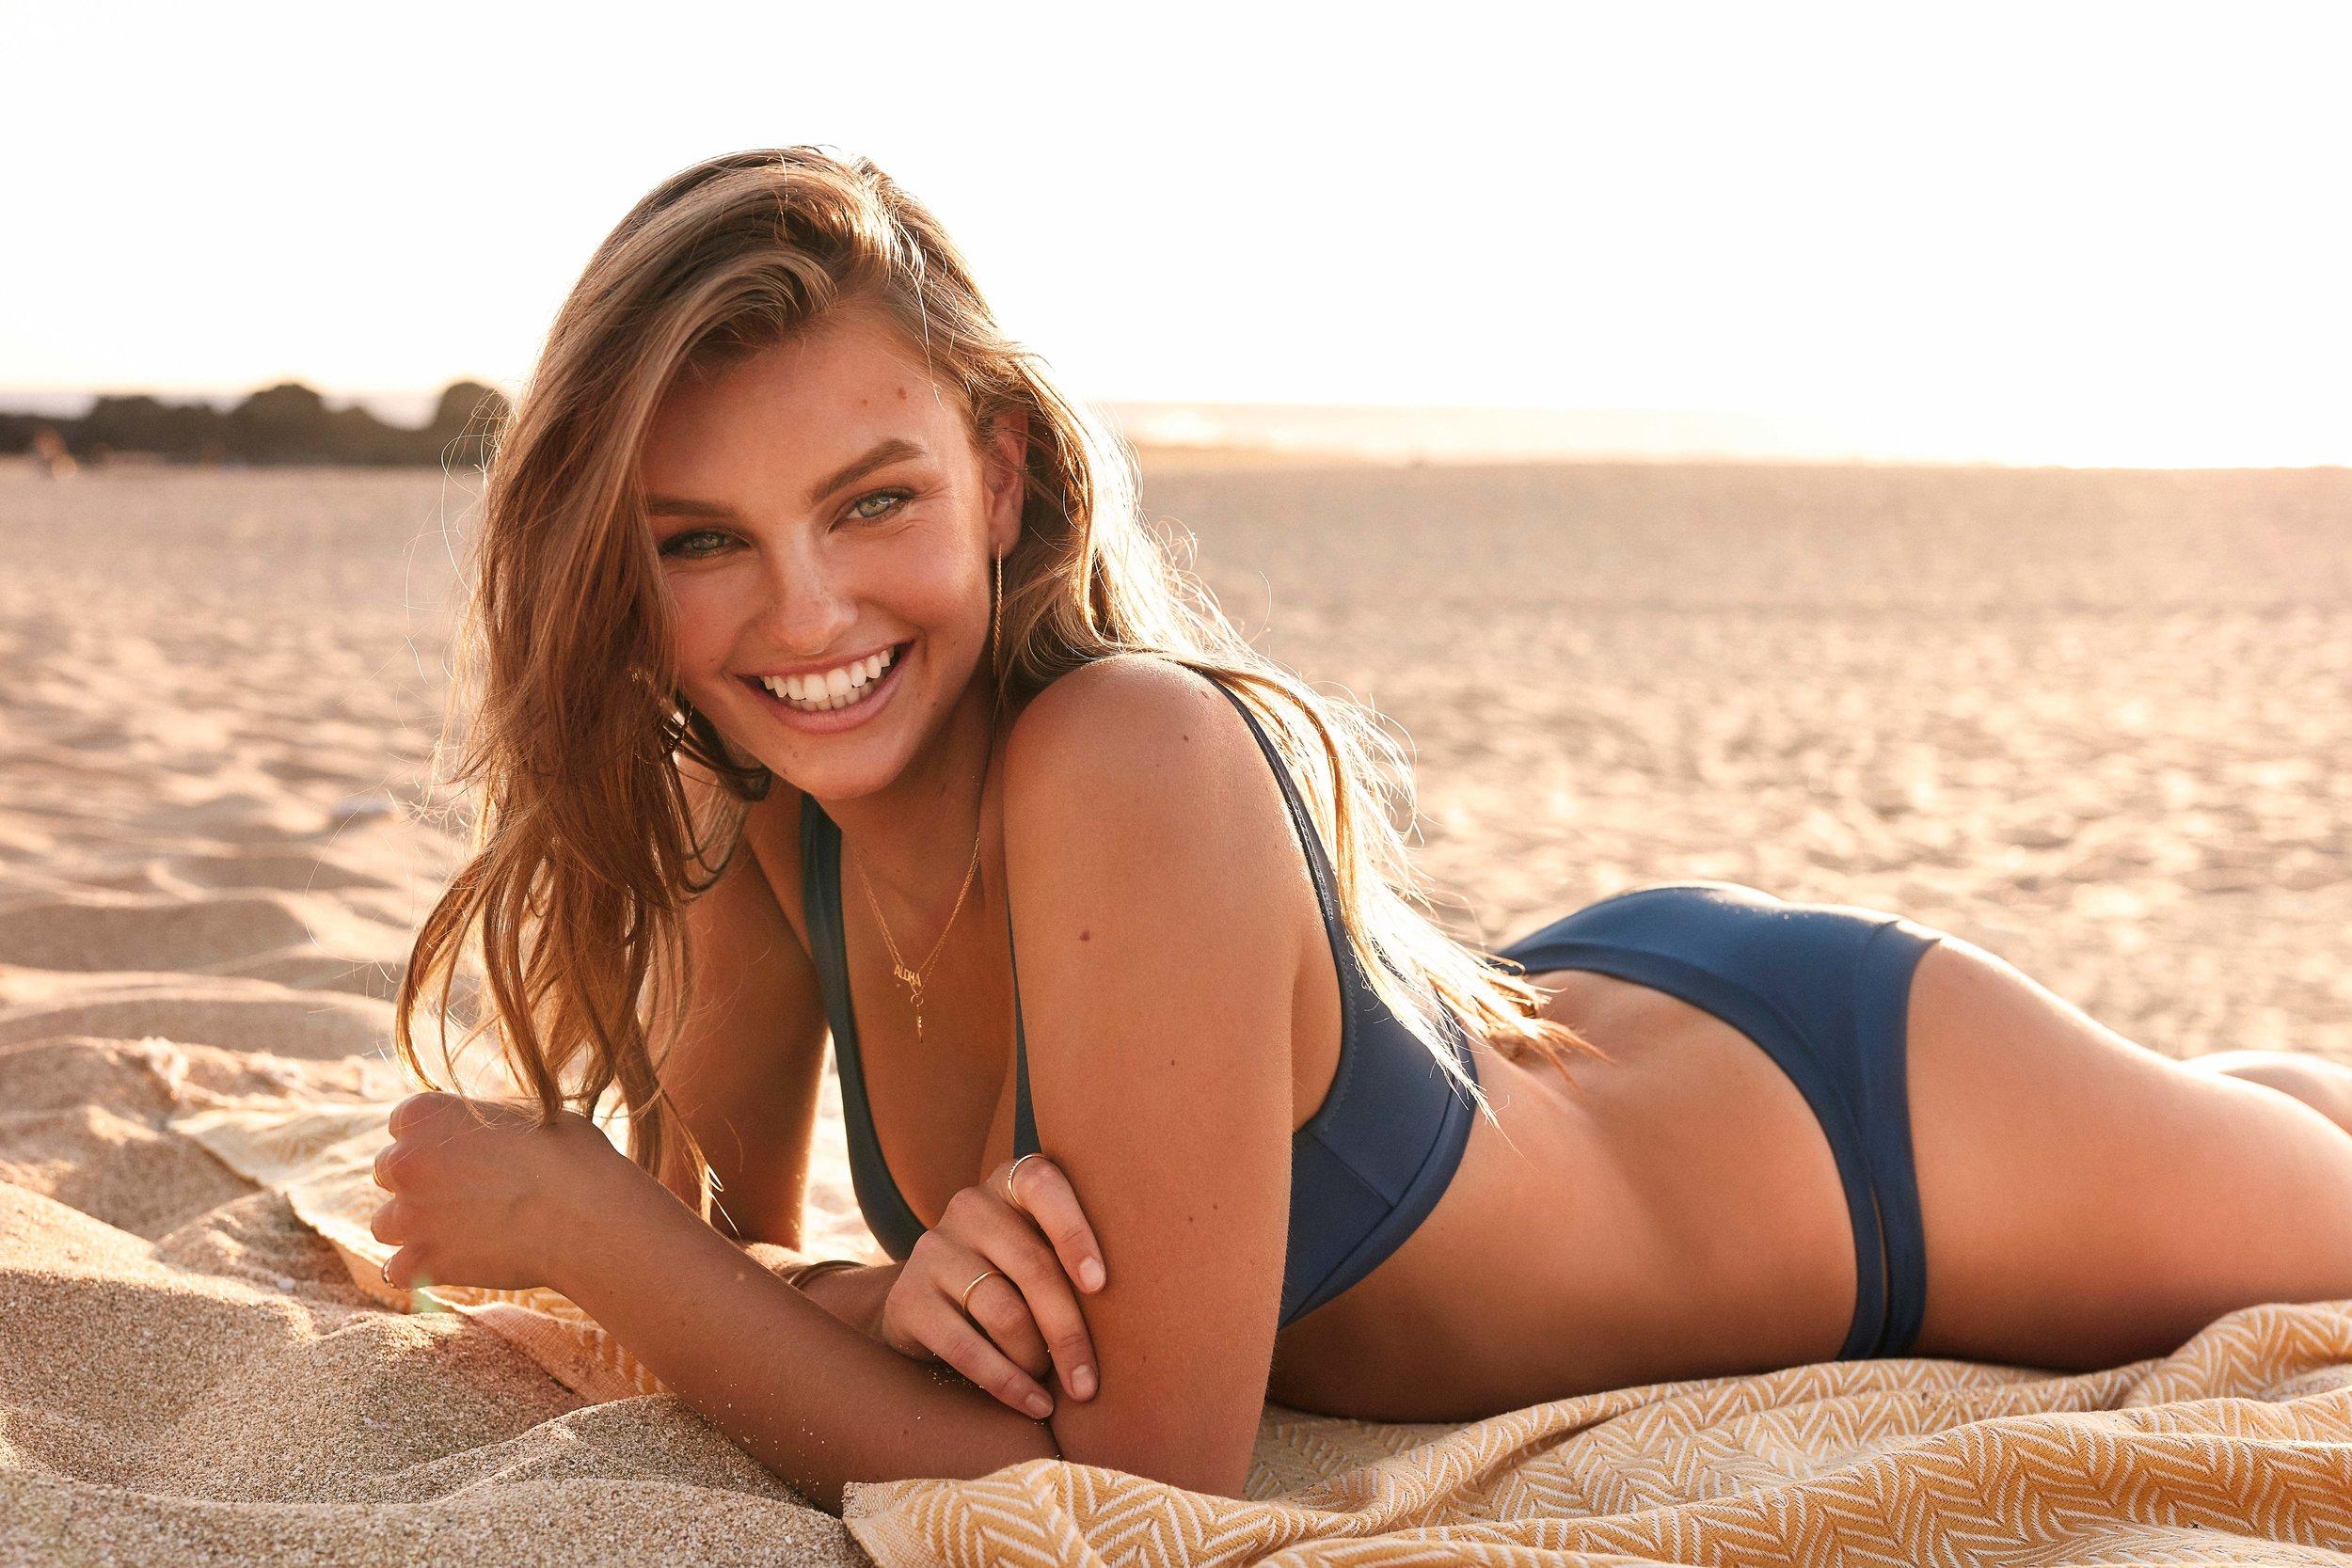 Gidget Scoop Top Sea & Sunchaser Itsy Pant Sea & Beach Towel Marigold 2.jpg